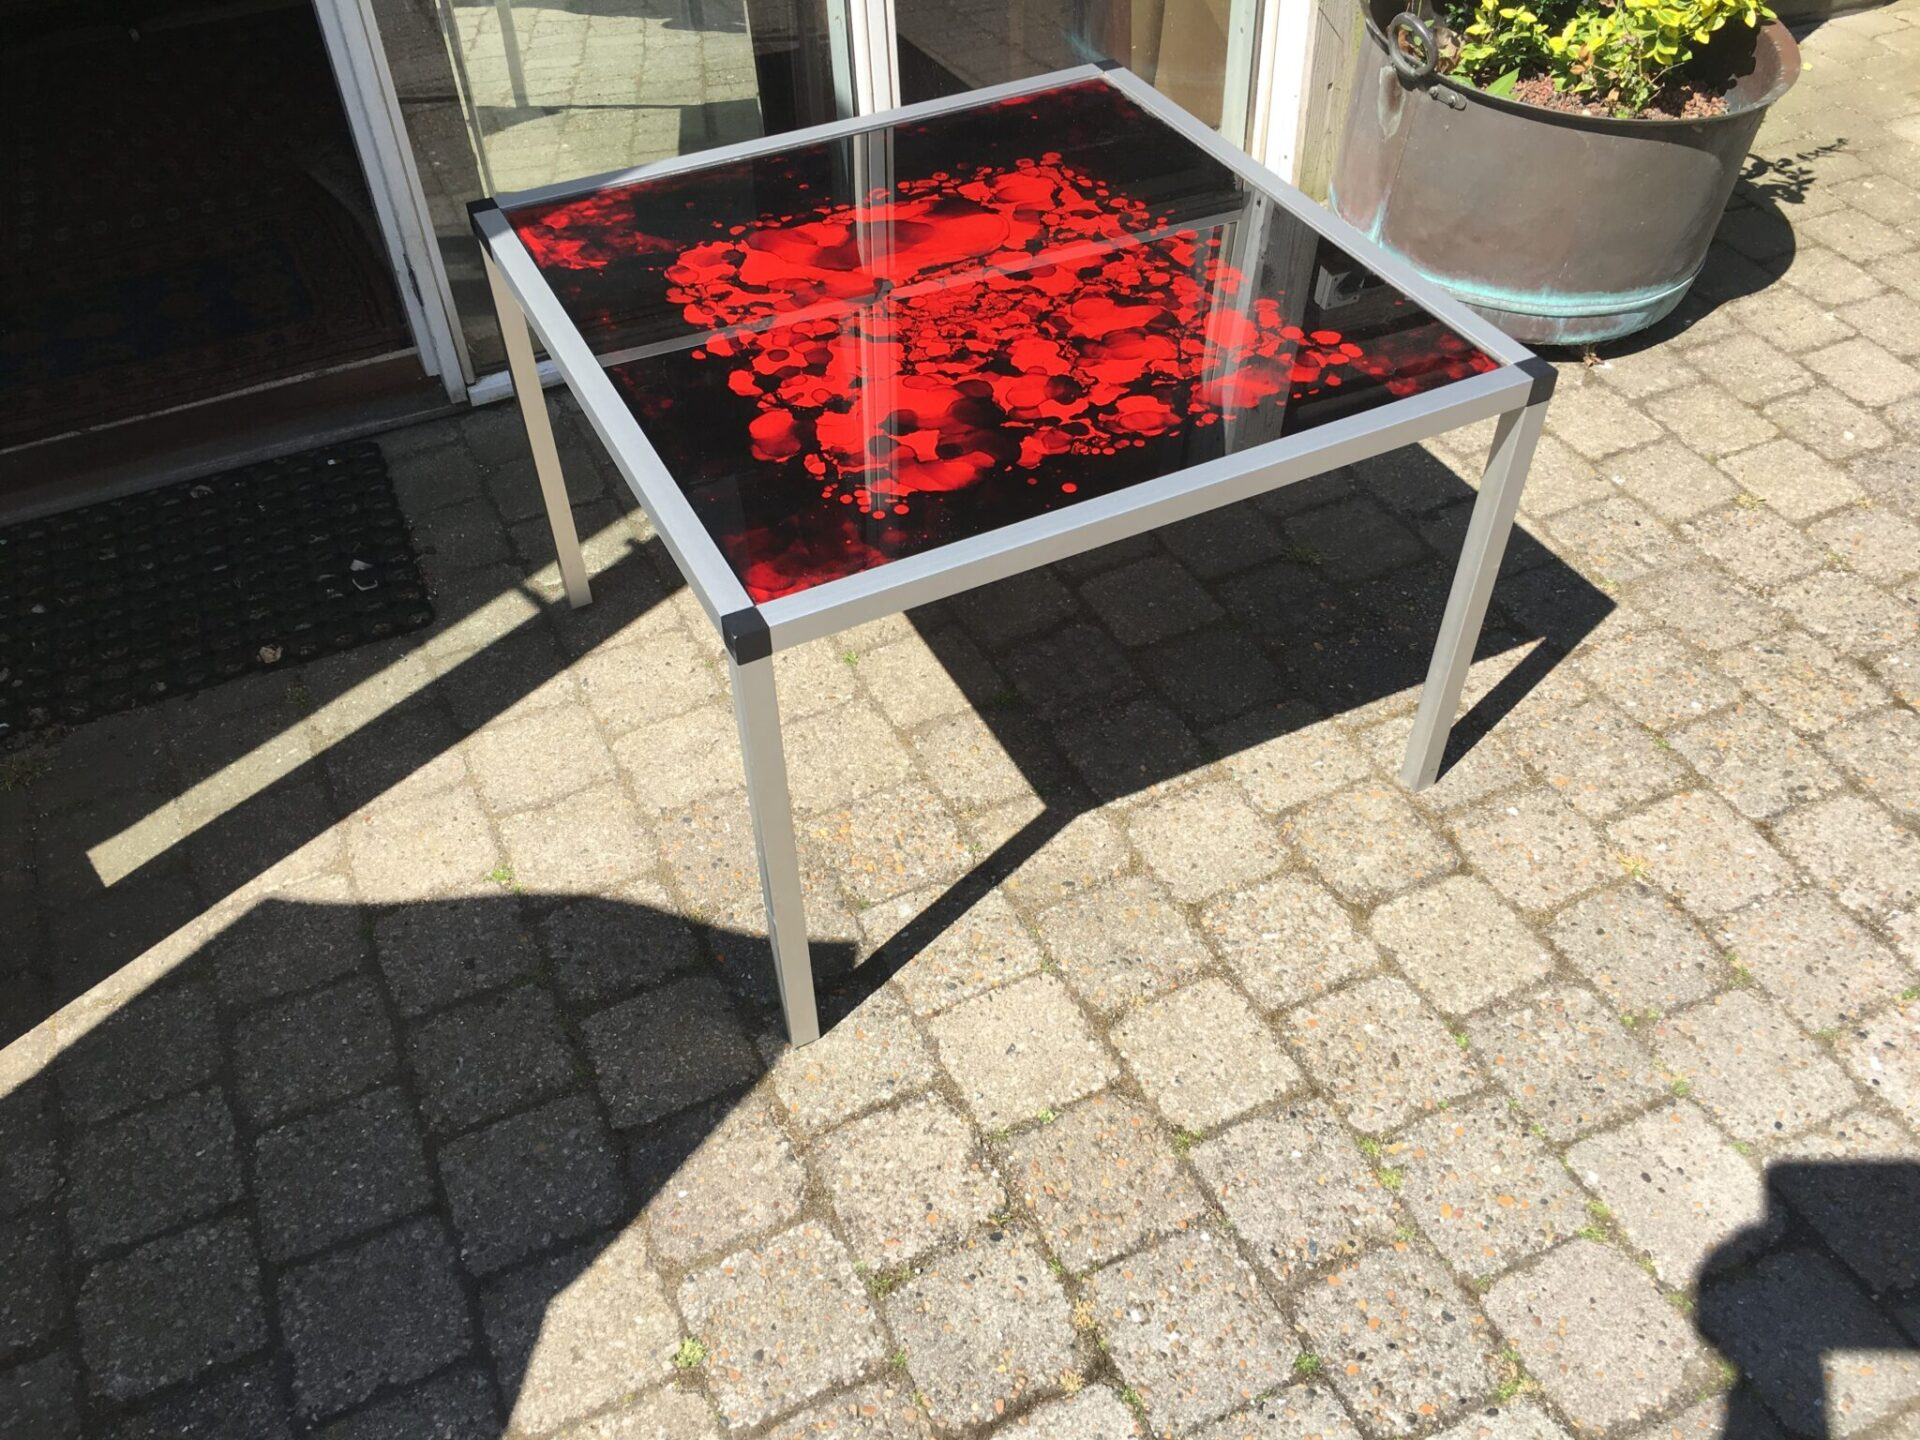 80-bord med rød glasplade (70x70 cm) pris 100 kr